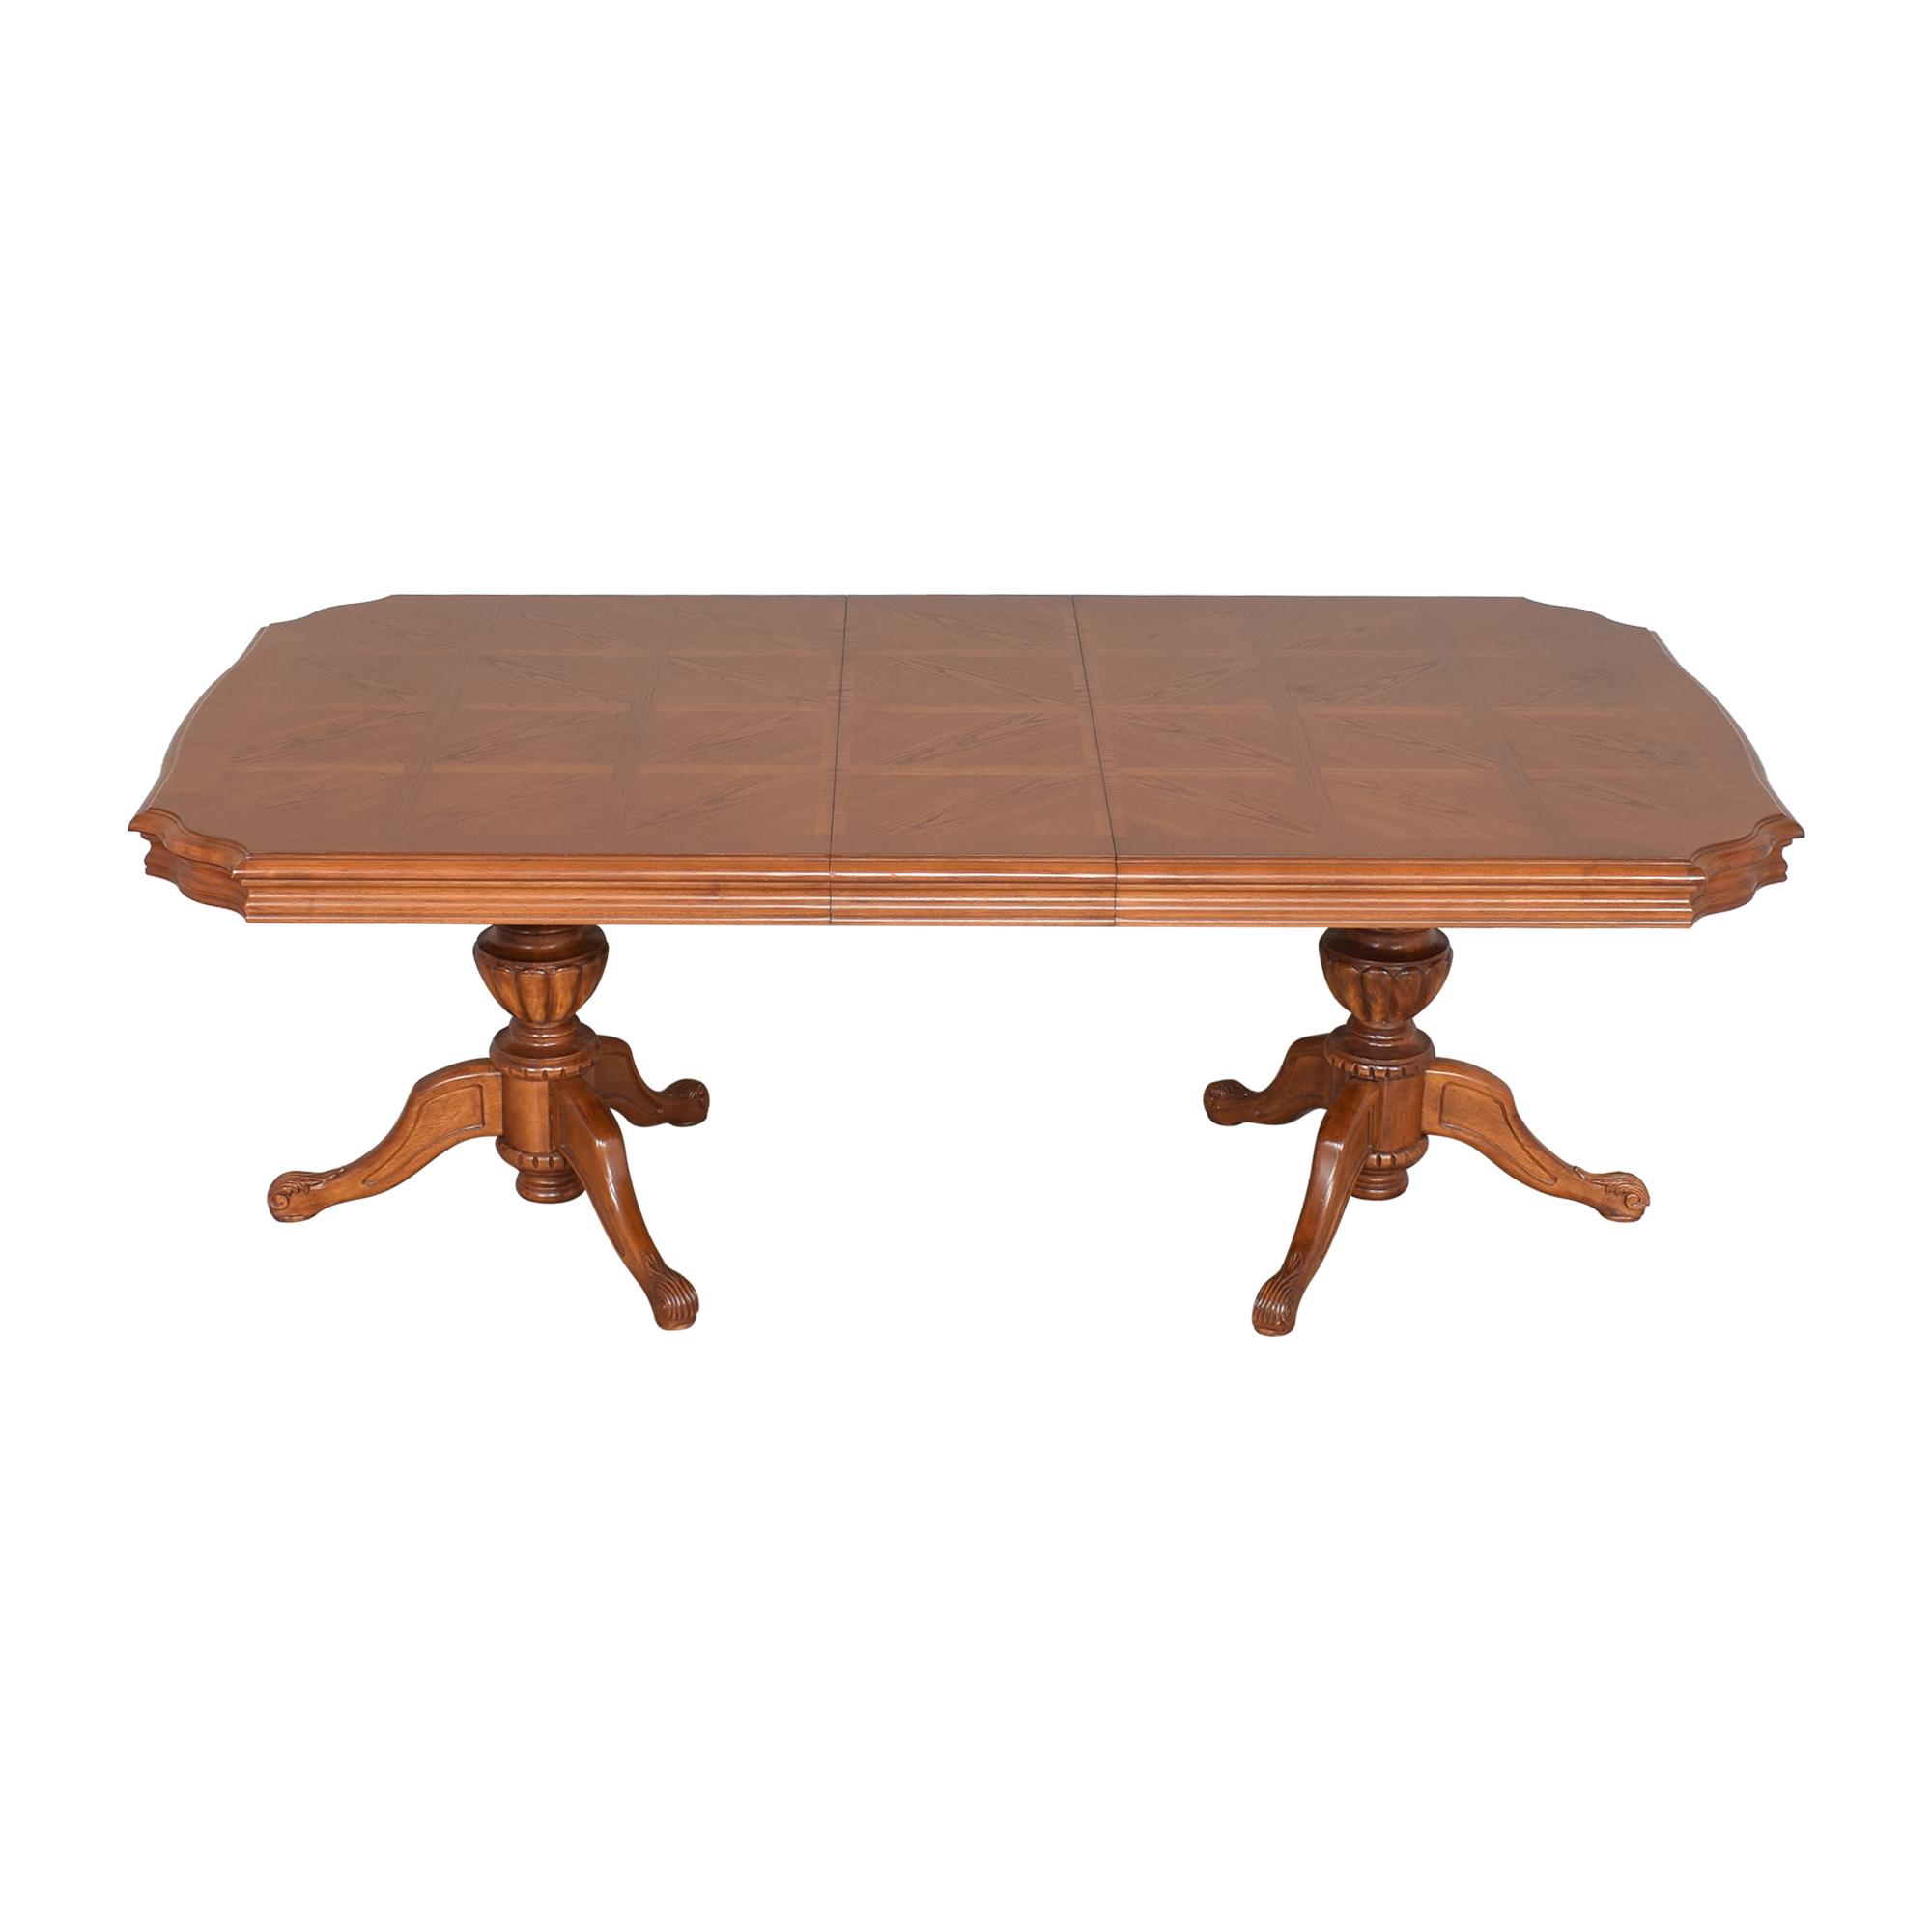 North Carolina Furniture Company North Carolina Furniture Extendable Dining Table price